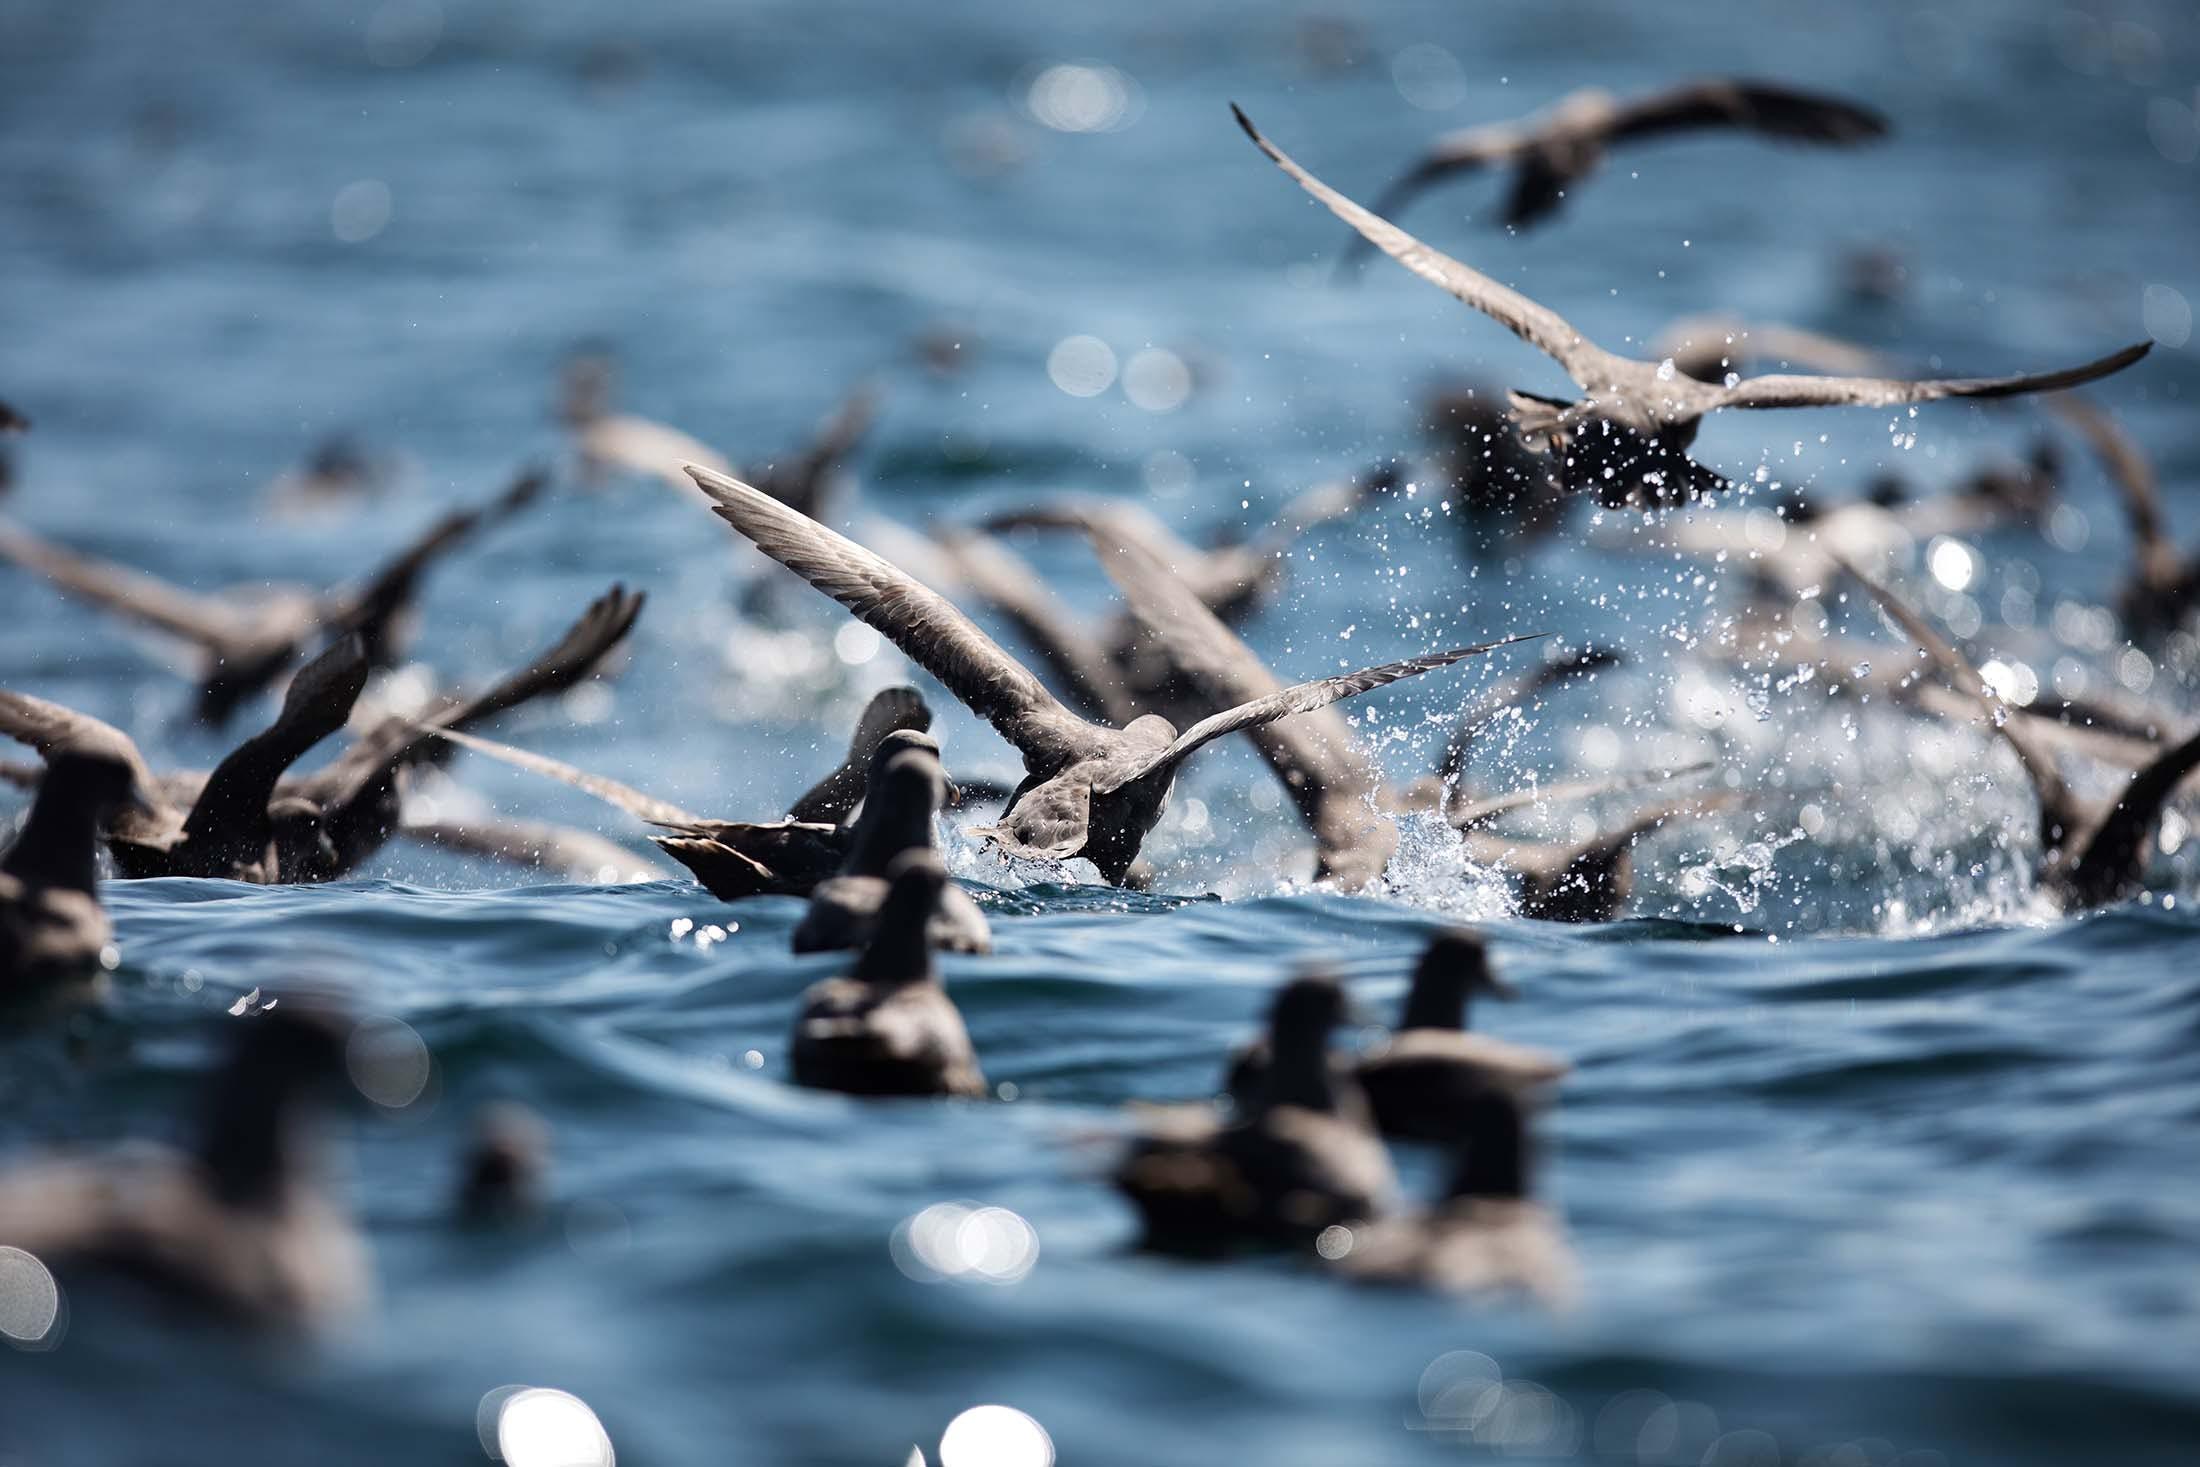 Northern Fulmars on the sea surface, near Iony Island in the Sea Of Okhotsk